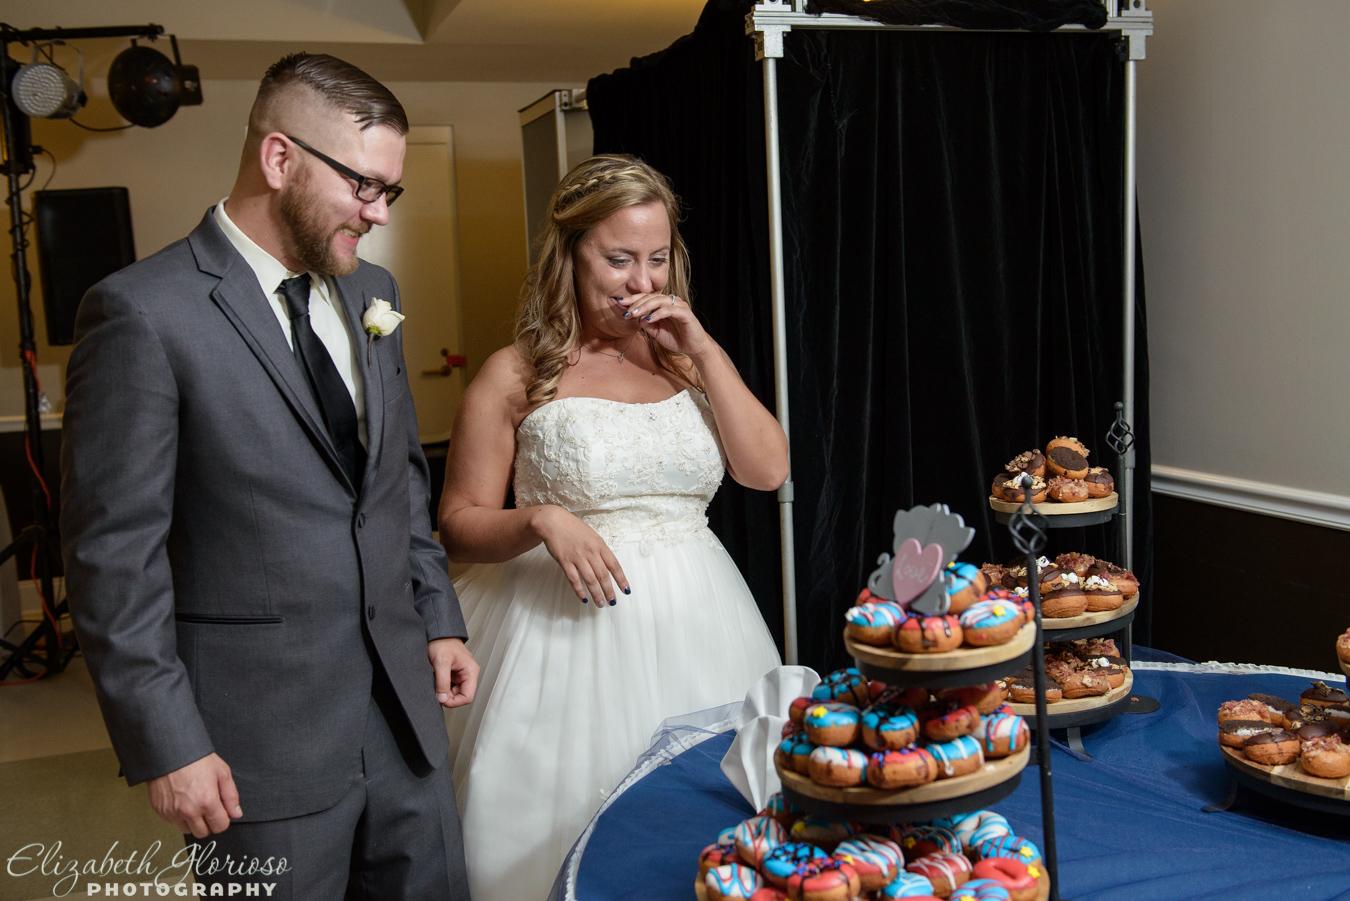 Zakovec_Wedding_Glorioso_Photography_Cleveland-139